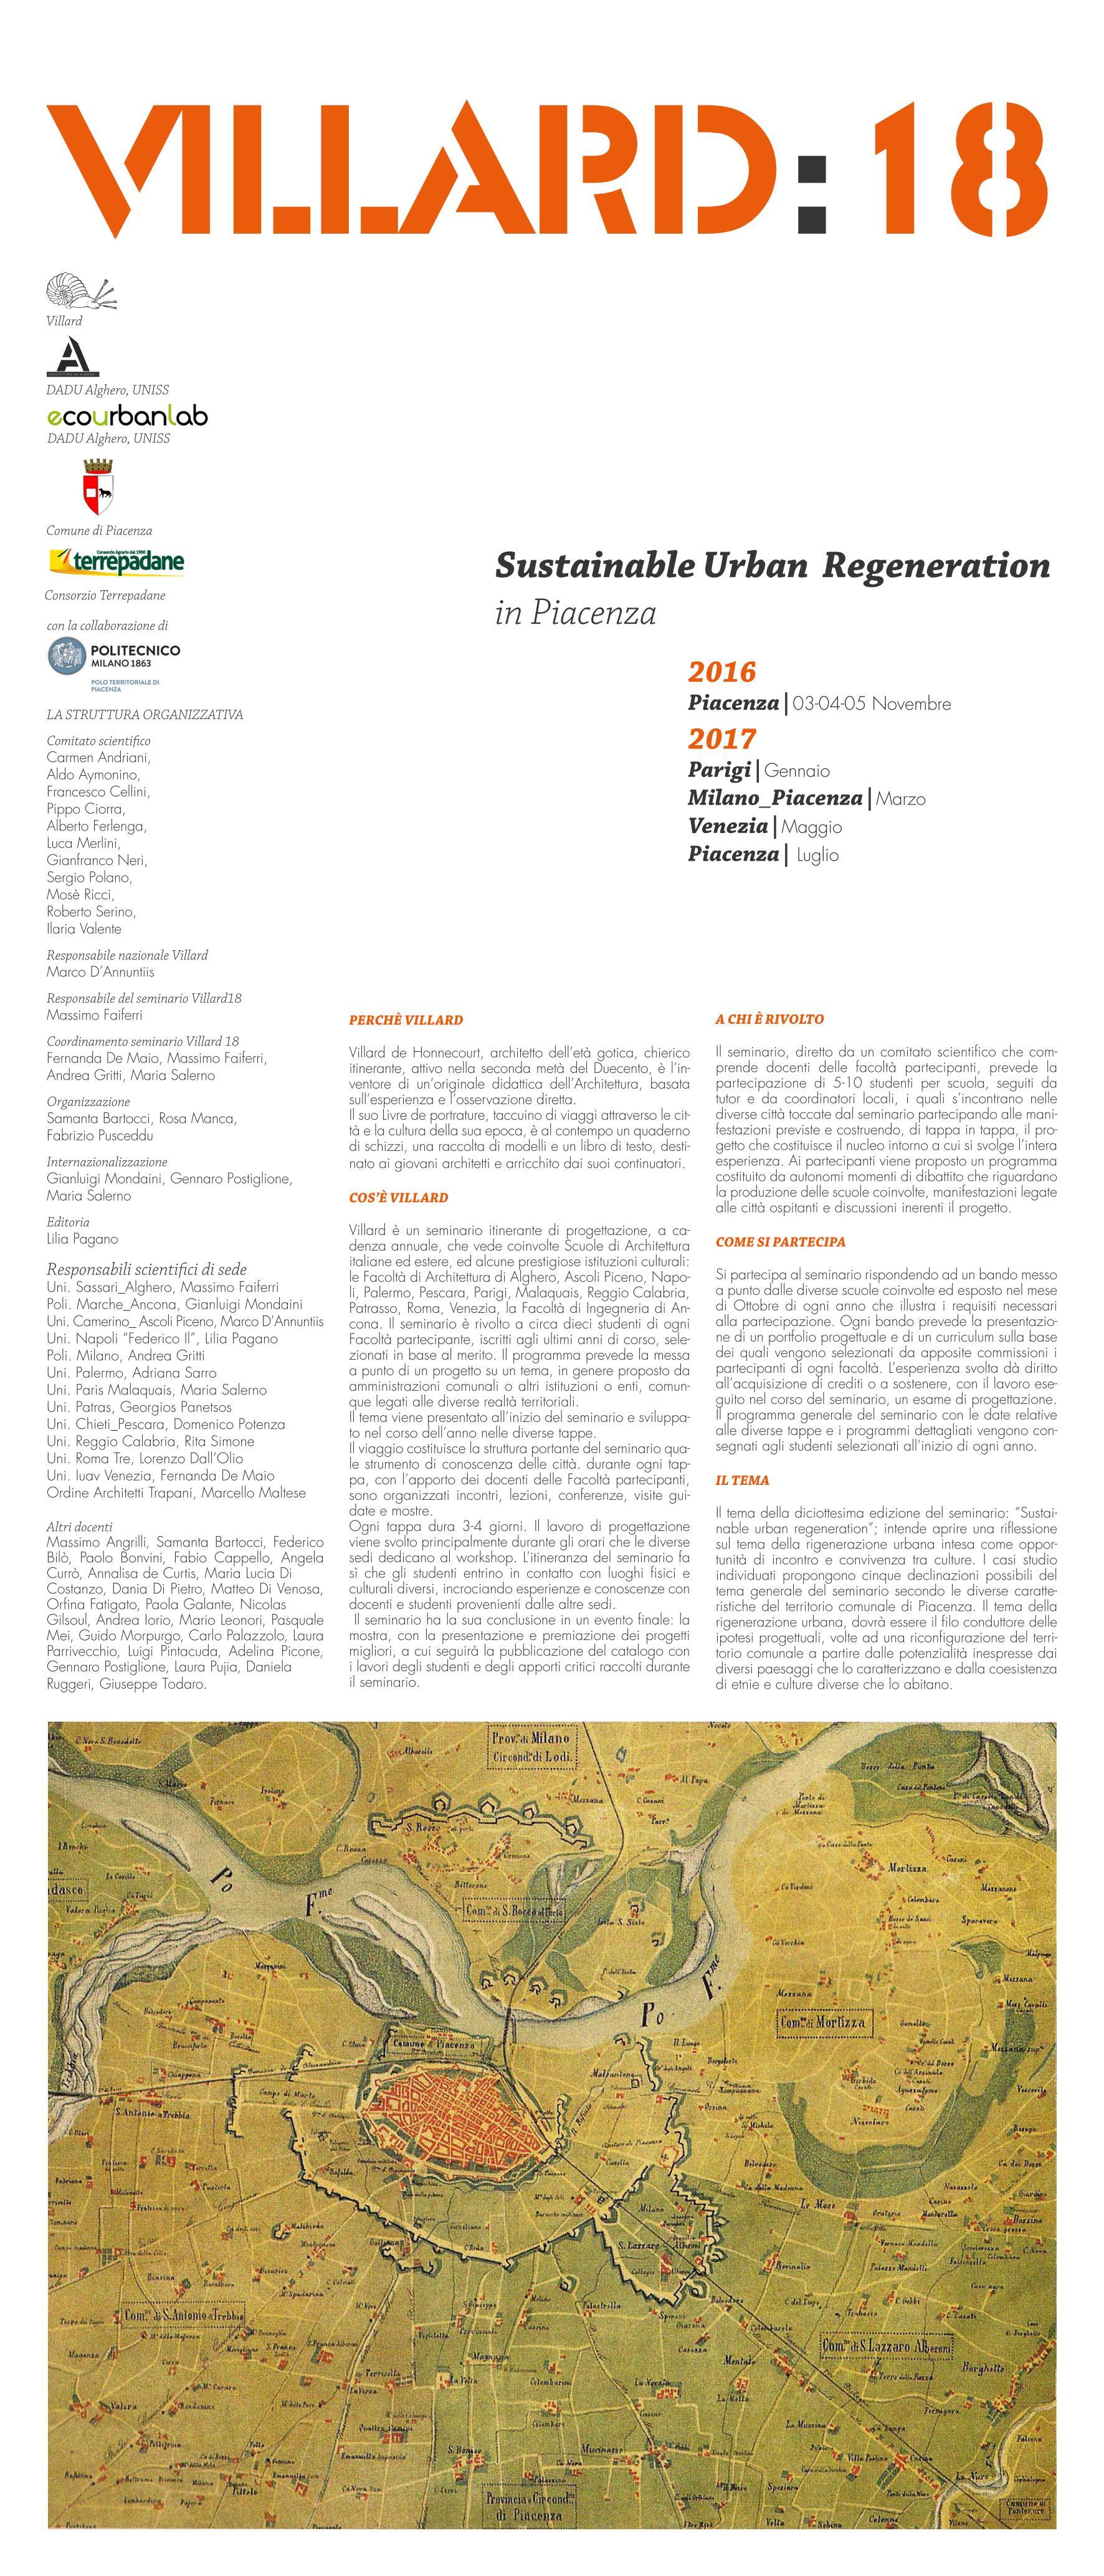 Villard 18                 Sustainable Urban  Regeneration in Piacenza